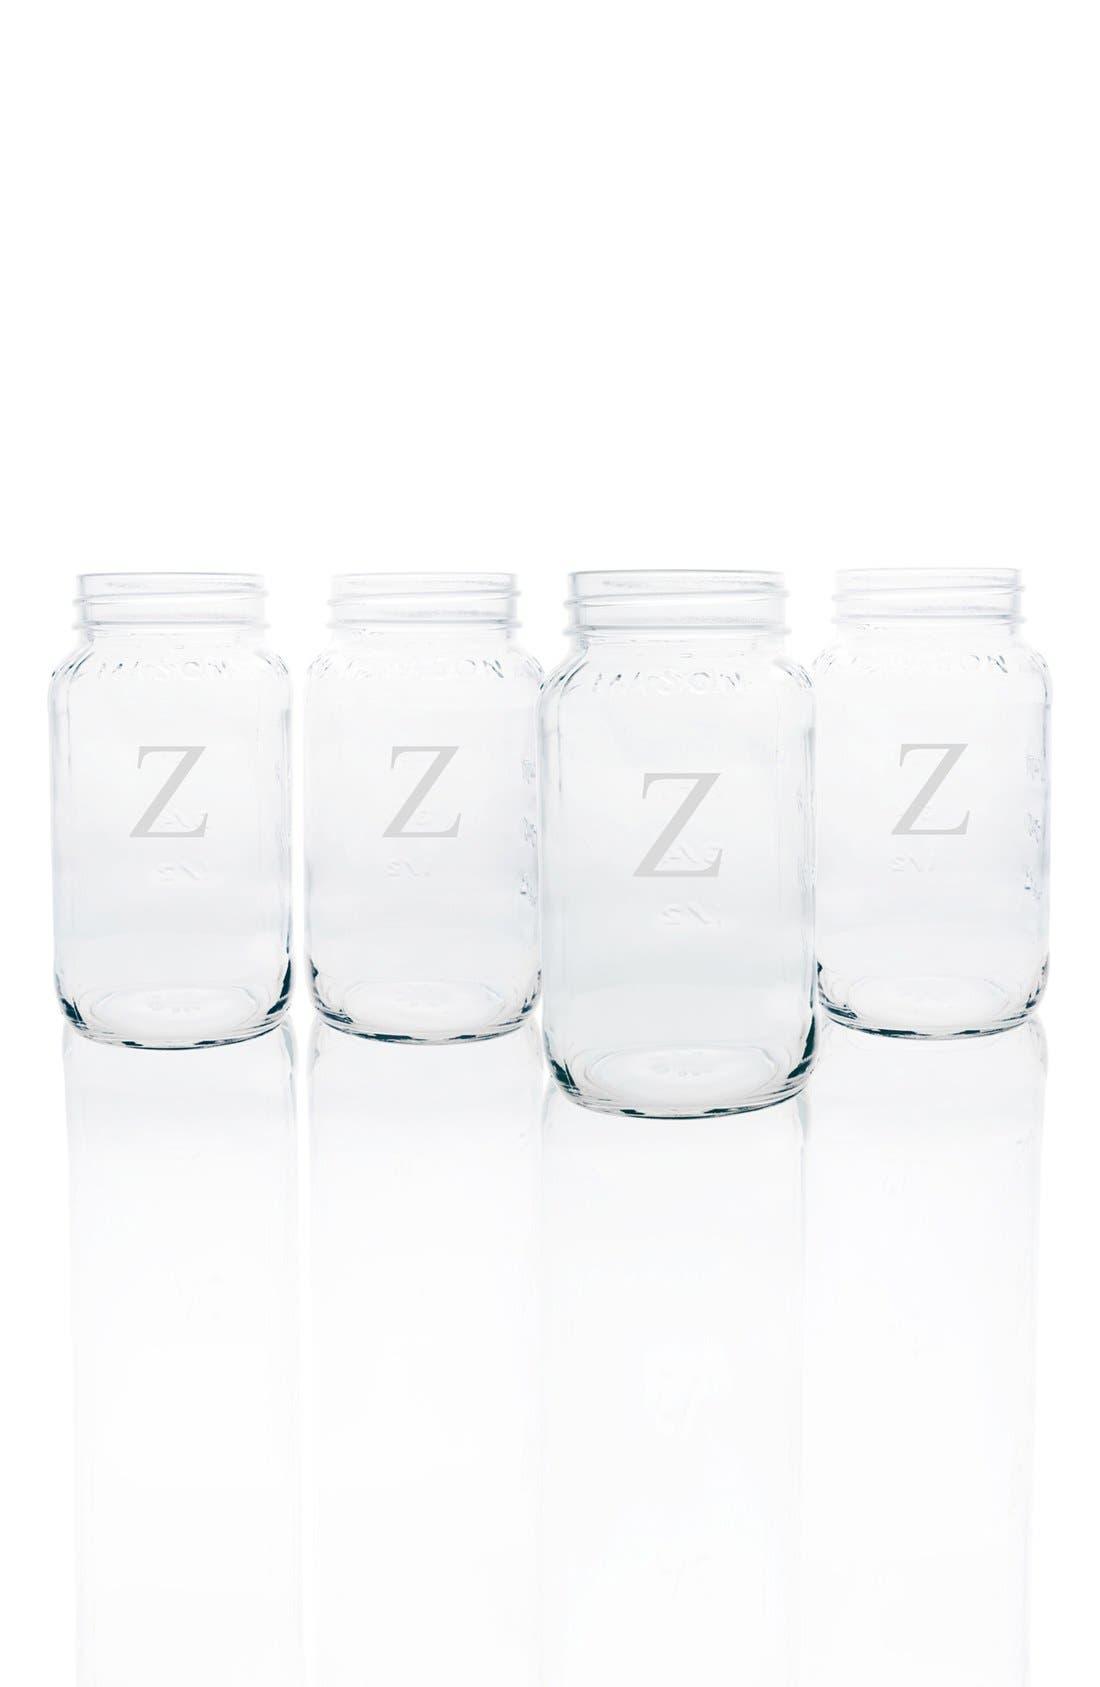 CATHY'S CONCEPTS, Monogram Glass Mason Jar Mugs, Main thumbnail 1, color, CLEAR-Z